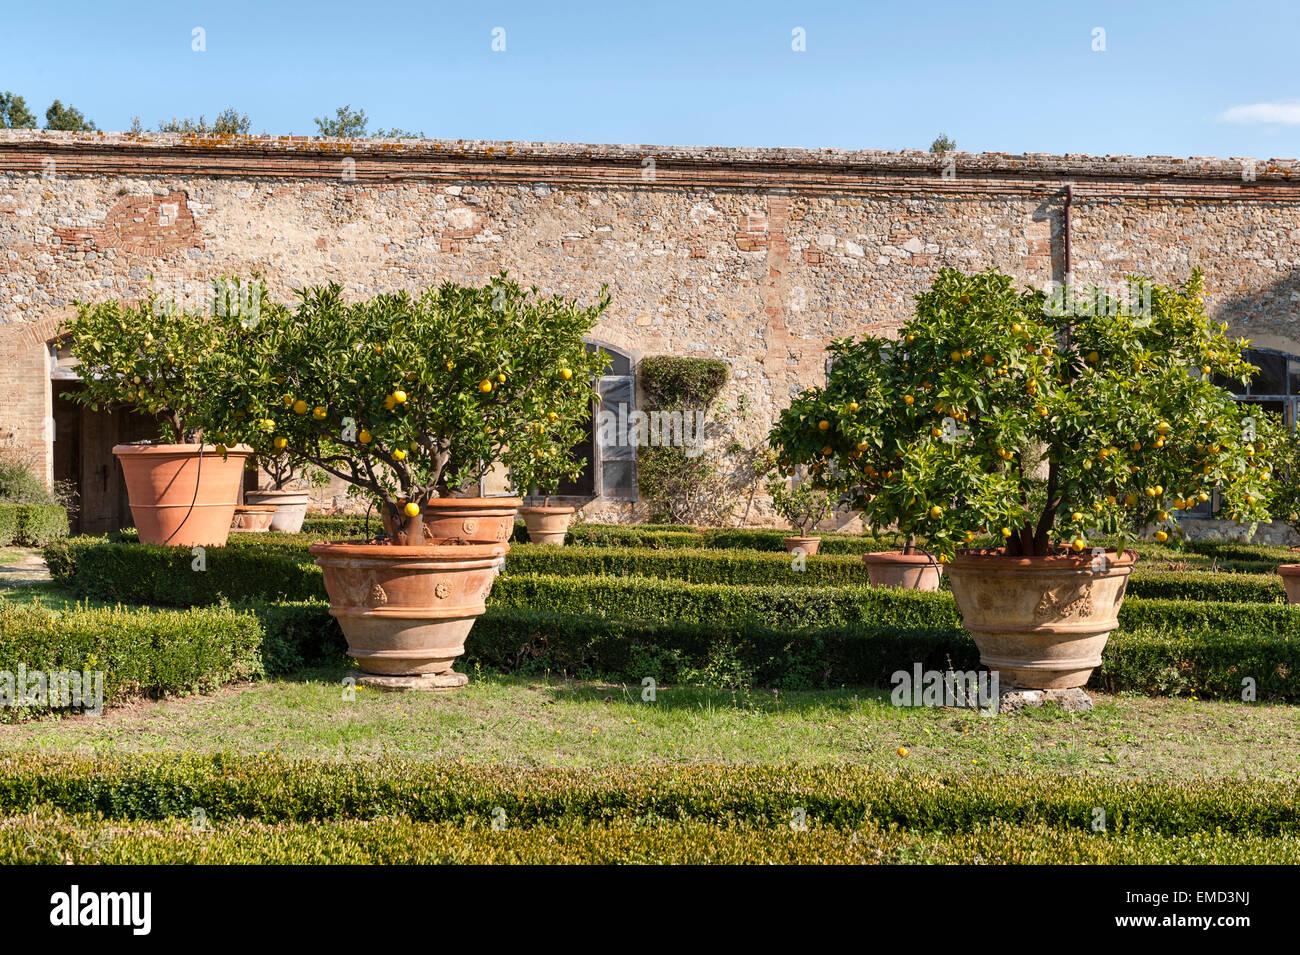 Vicobello, Siena, Tuscany, Italy. The formal Italian garden with clipped box hedges and pots of lemon trees outside - Stock Image